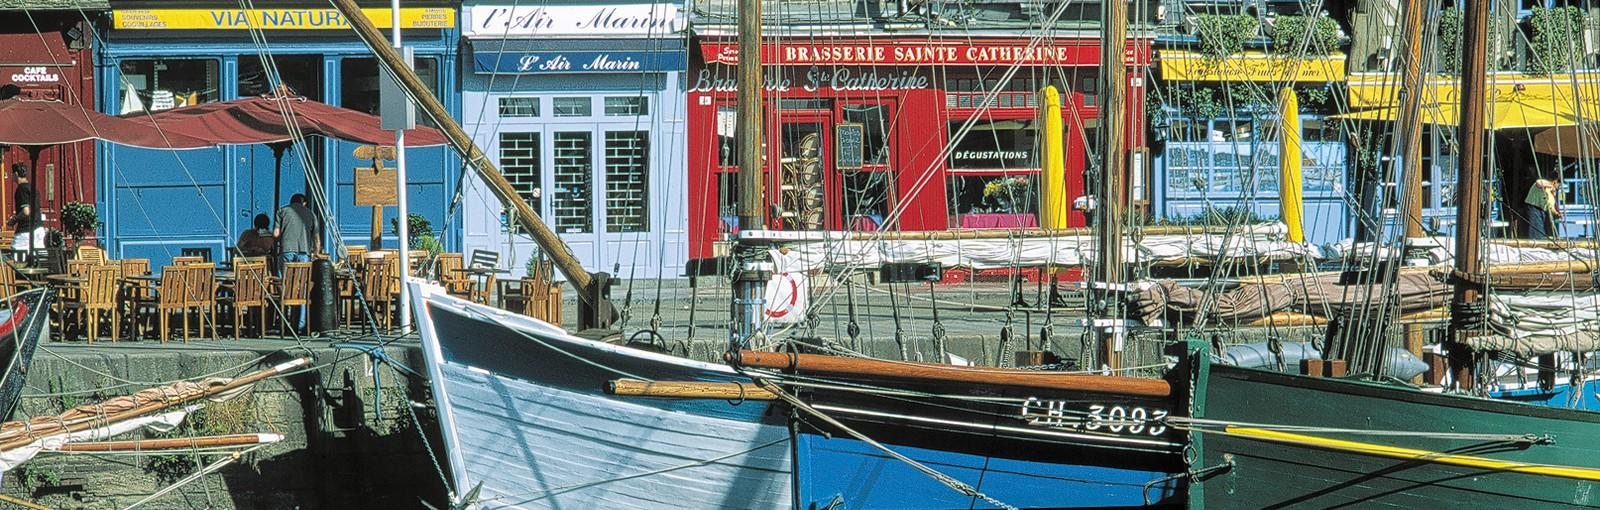 Tours 诺曼底登陆海滩 - 诺曼底 - 从巴黎出发的多日游